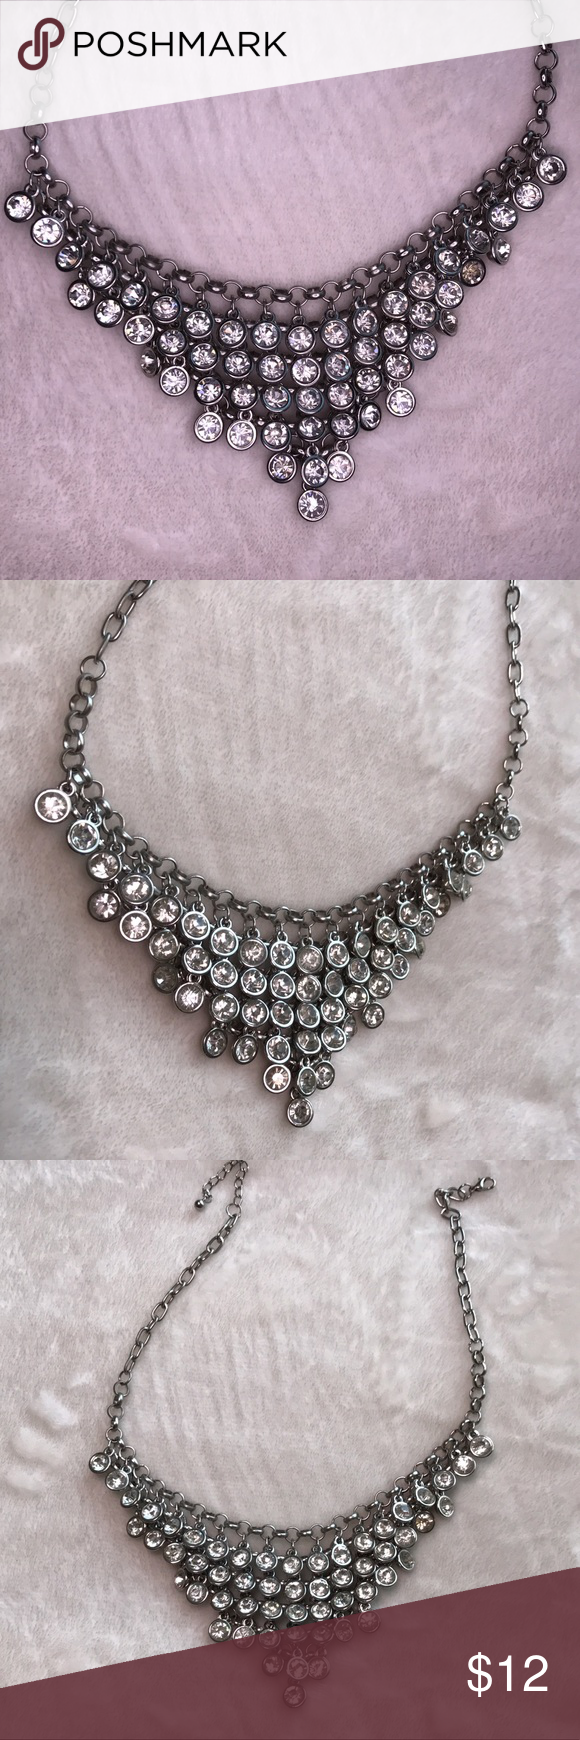 18+ Fake diamond necklace costume jewelry ideas